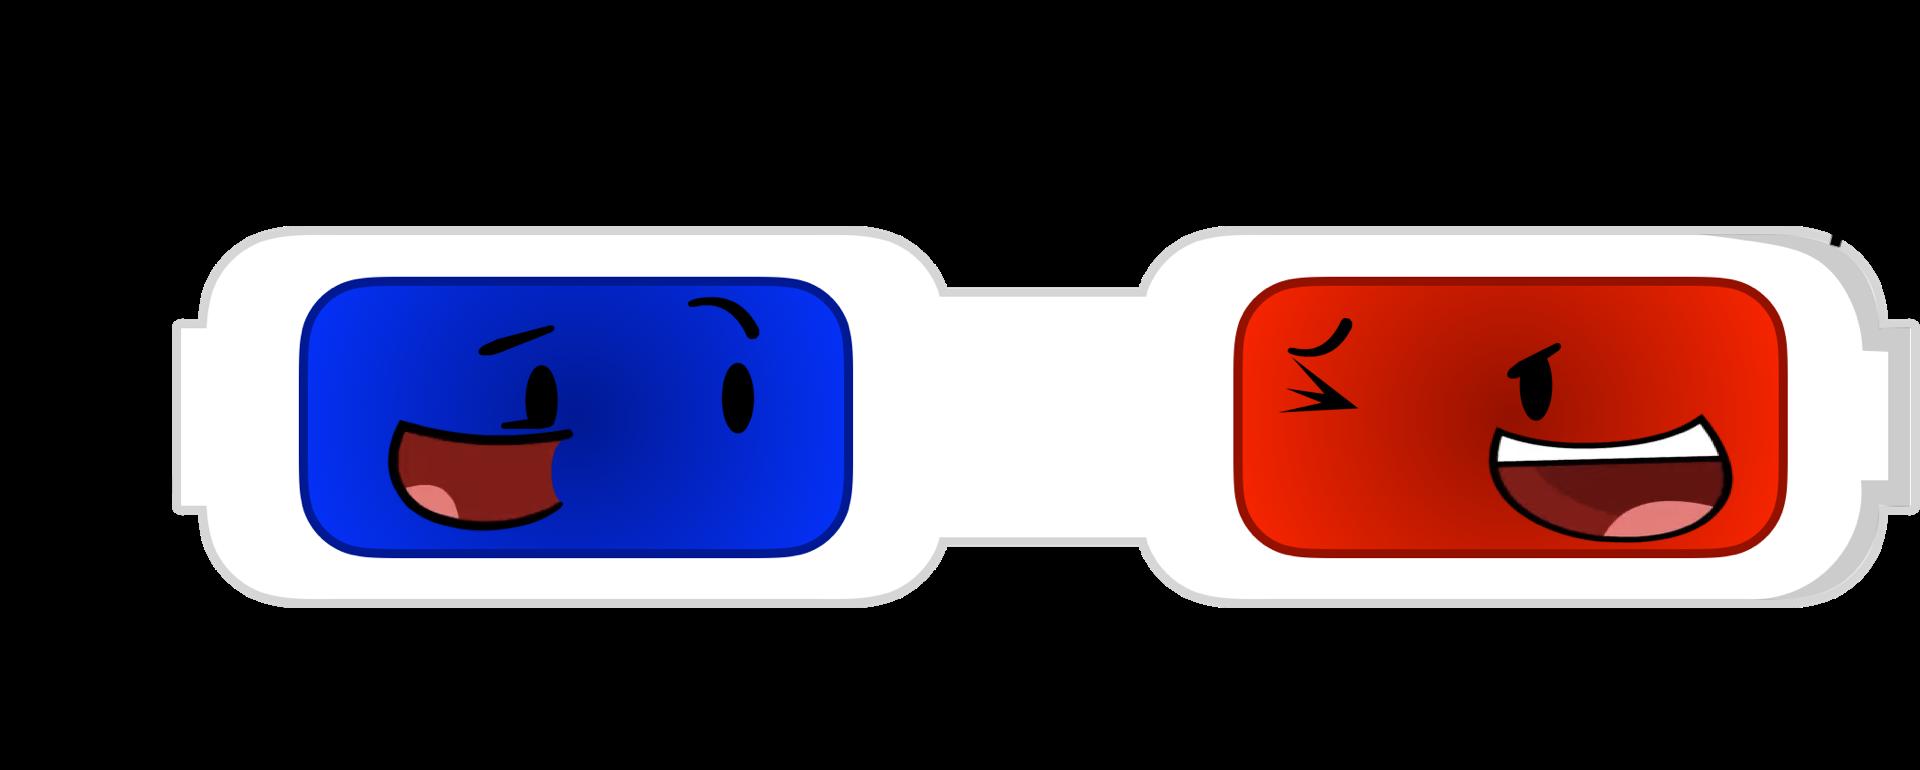 Glue clipart bfdi. Image updated d glasses